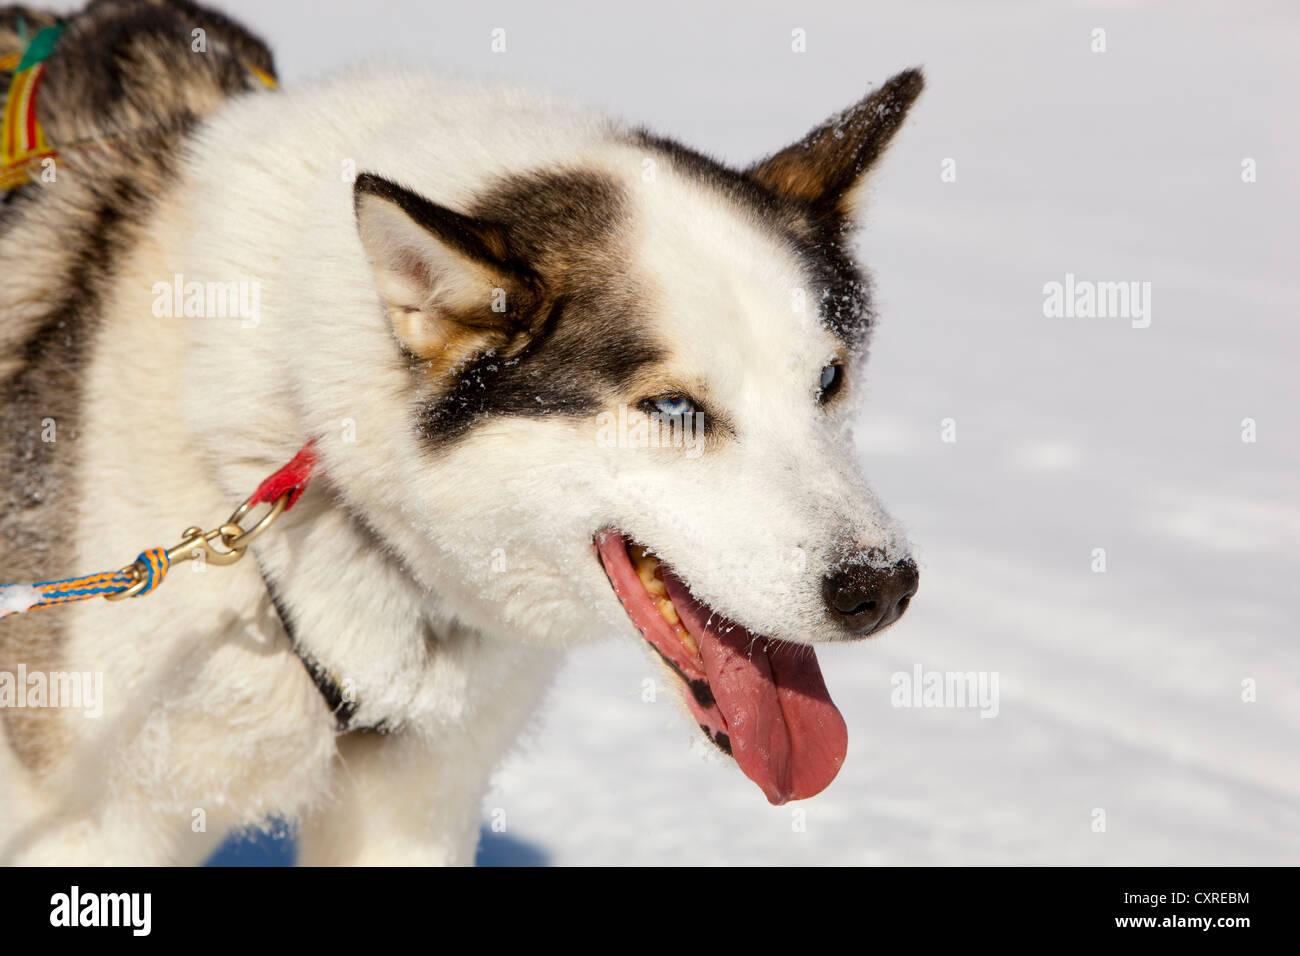 Sled Dog, cane piombo, Alaskan Husky, ansimando, congelati Yukon River, Yukon Territory, Canada Immagini Stock